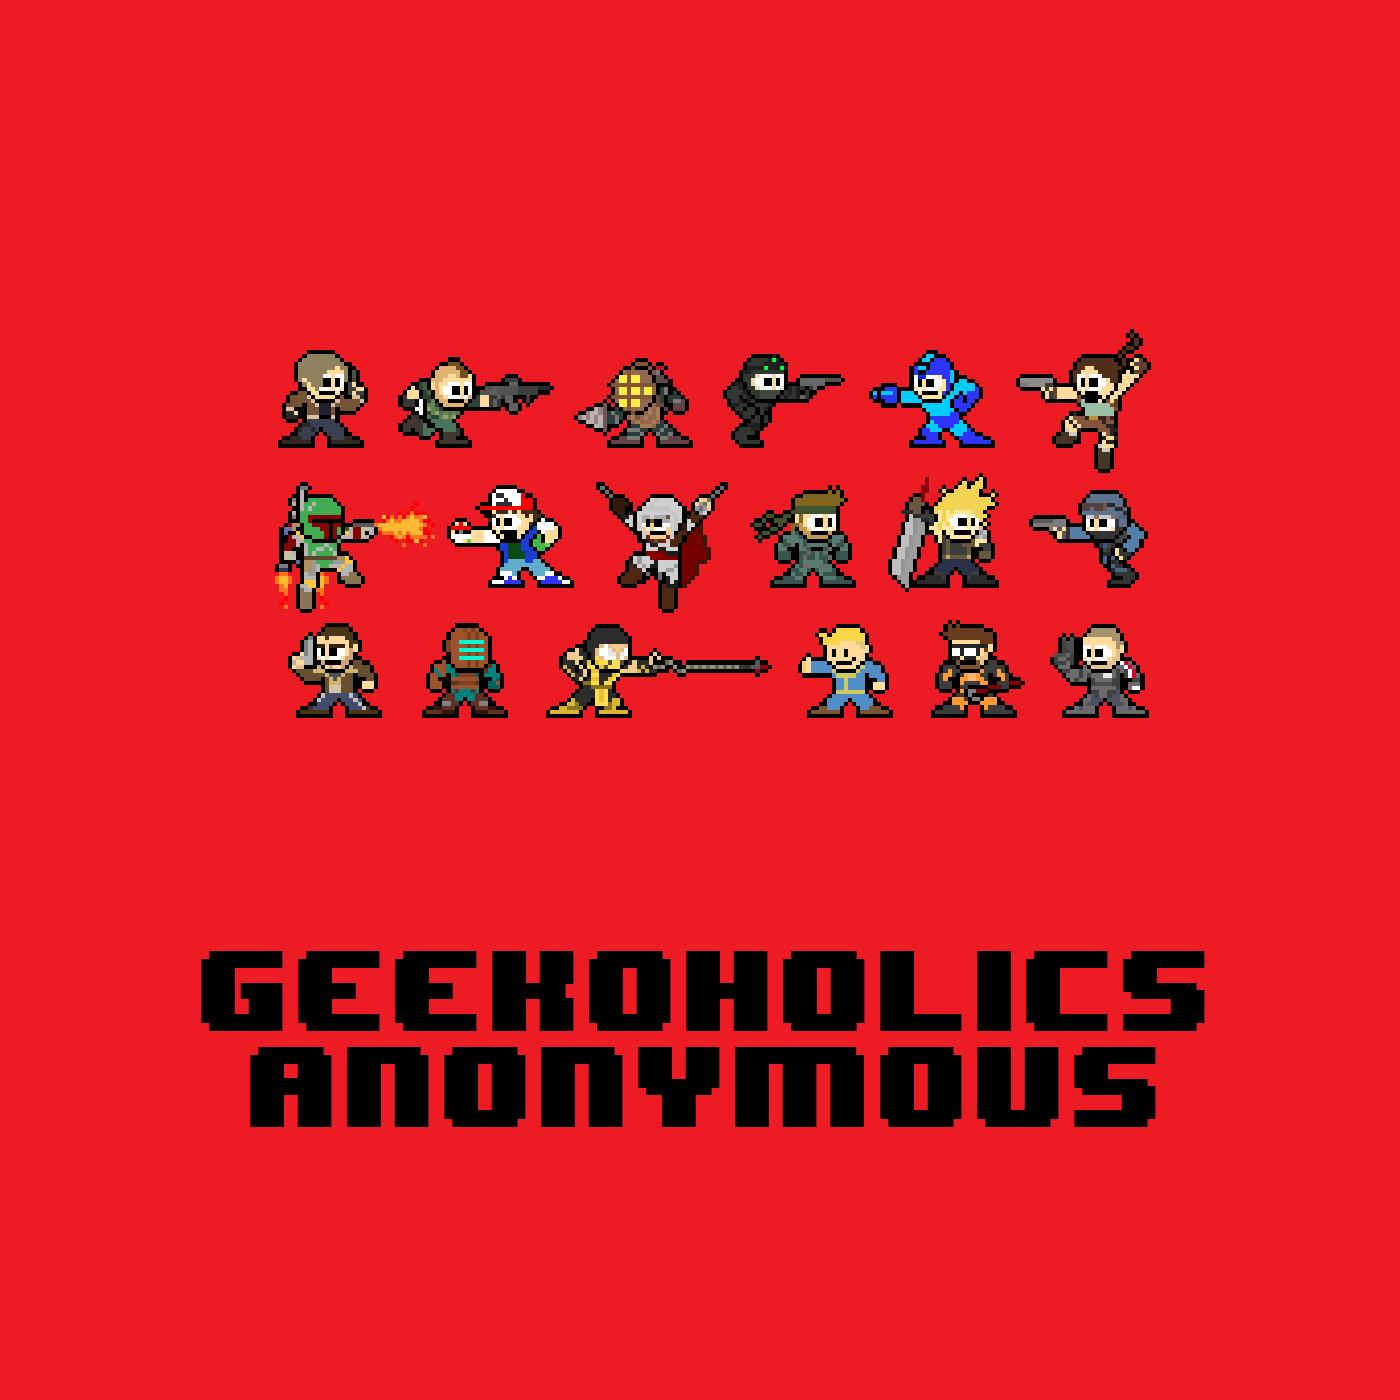 Metro Exodus, Final Fantasy XIV, E3 2021 and more - Geekoholics Anonymous Podcast 306 show art